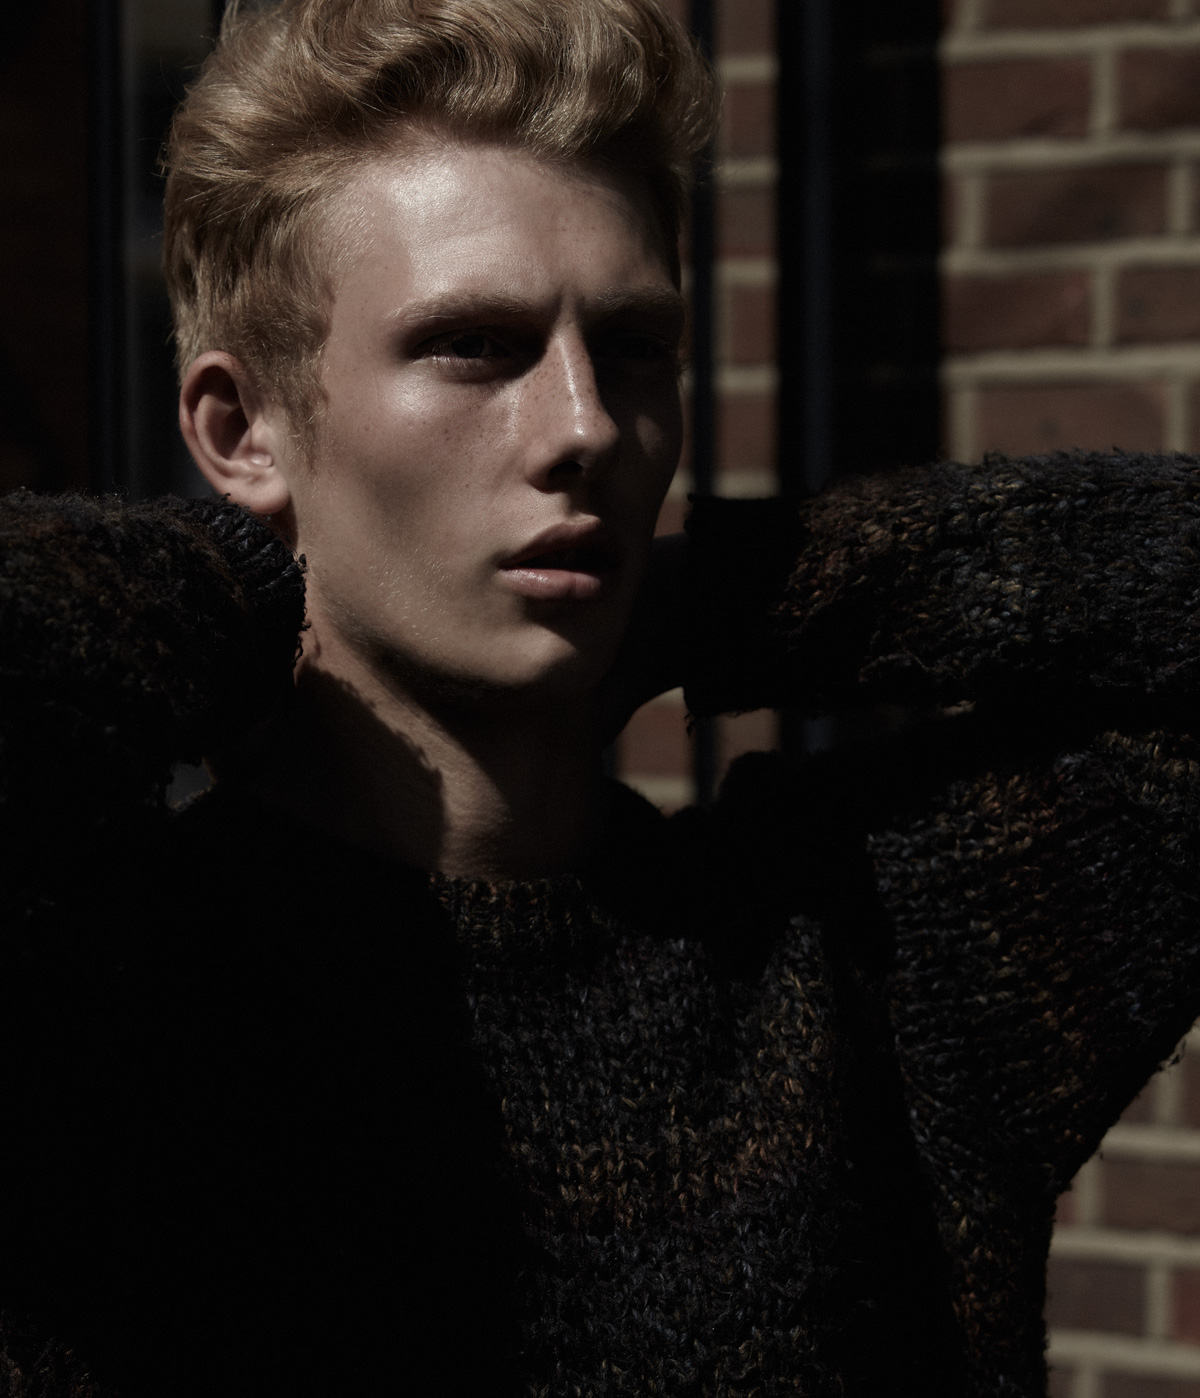 SAM-WALKER-Select-Models-Melissa-Uren-Photography-Look-40185-final-web.jpg